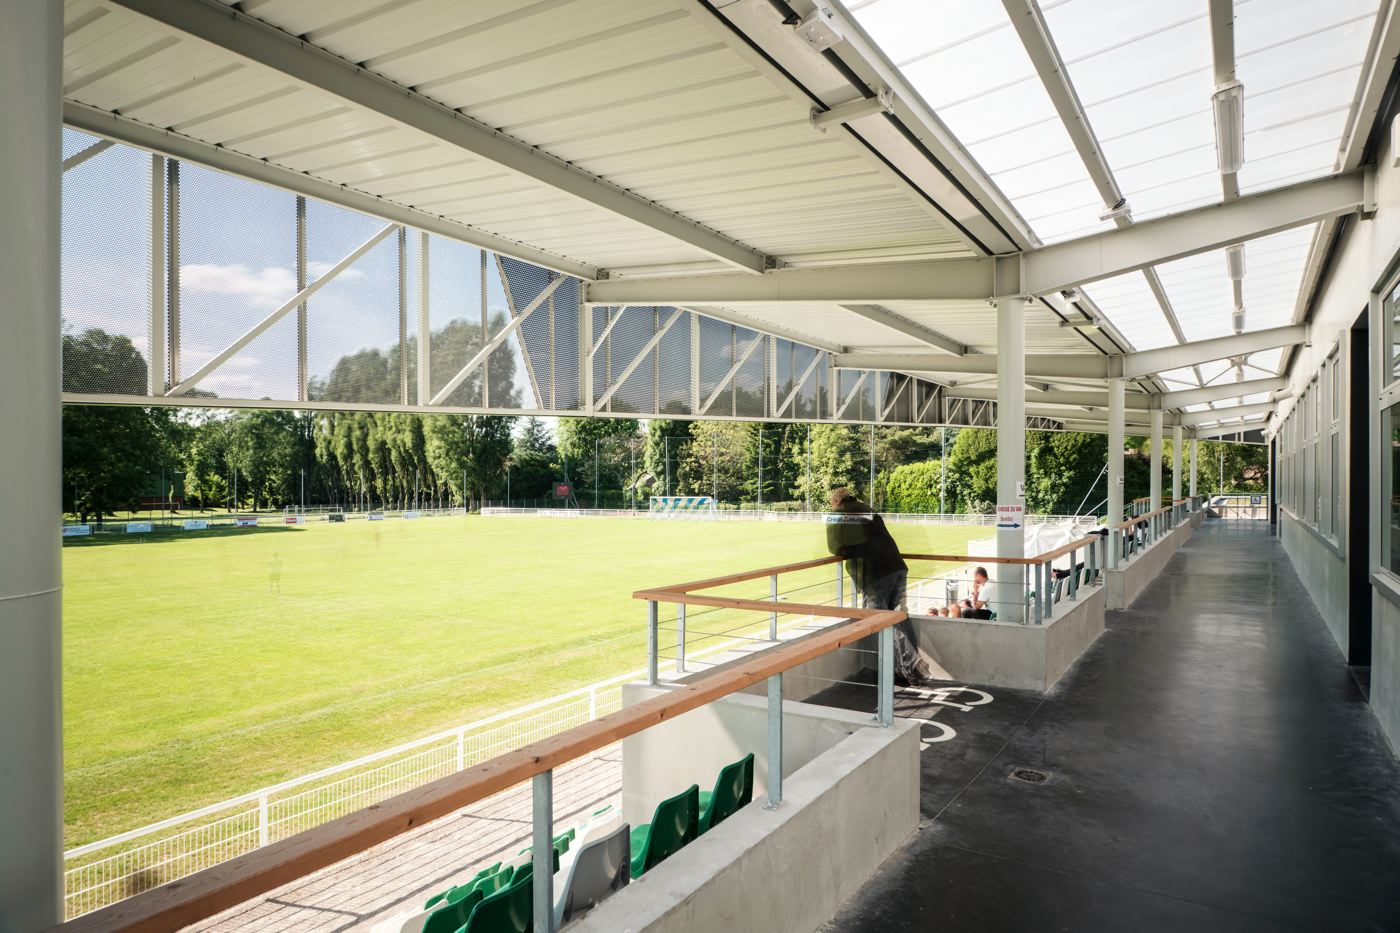 LDKphoto-EFarchi-Stade-Jean-Jacques-020.jpg